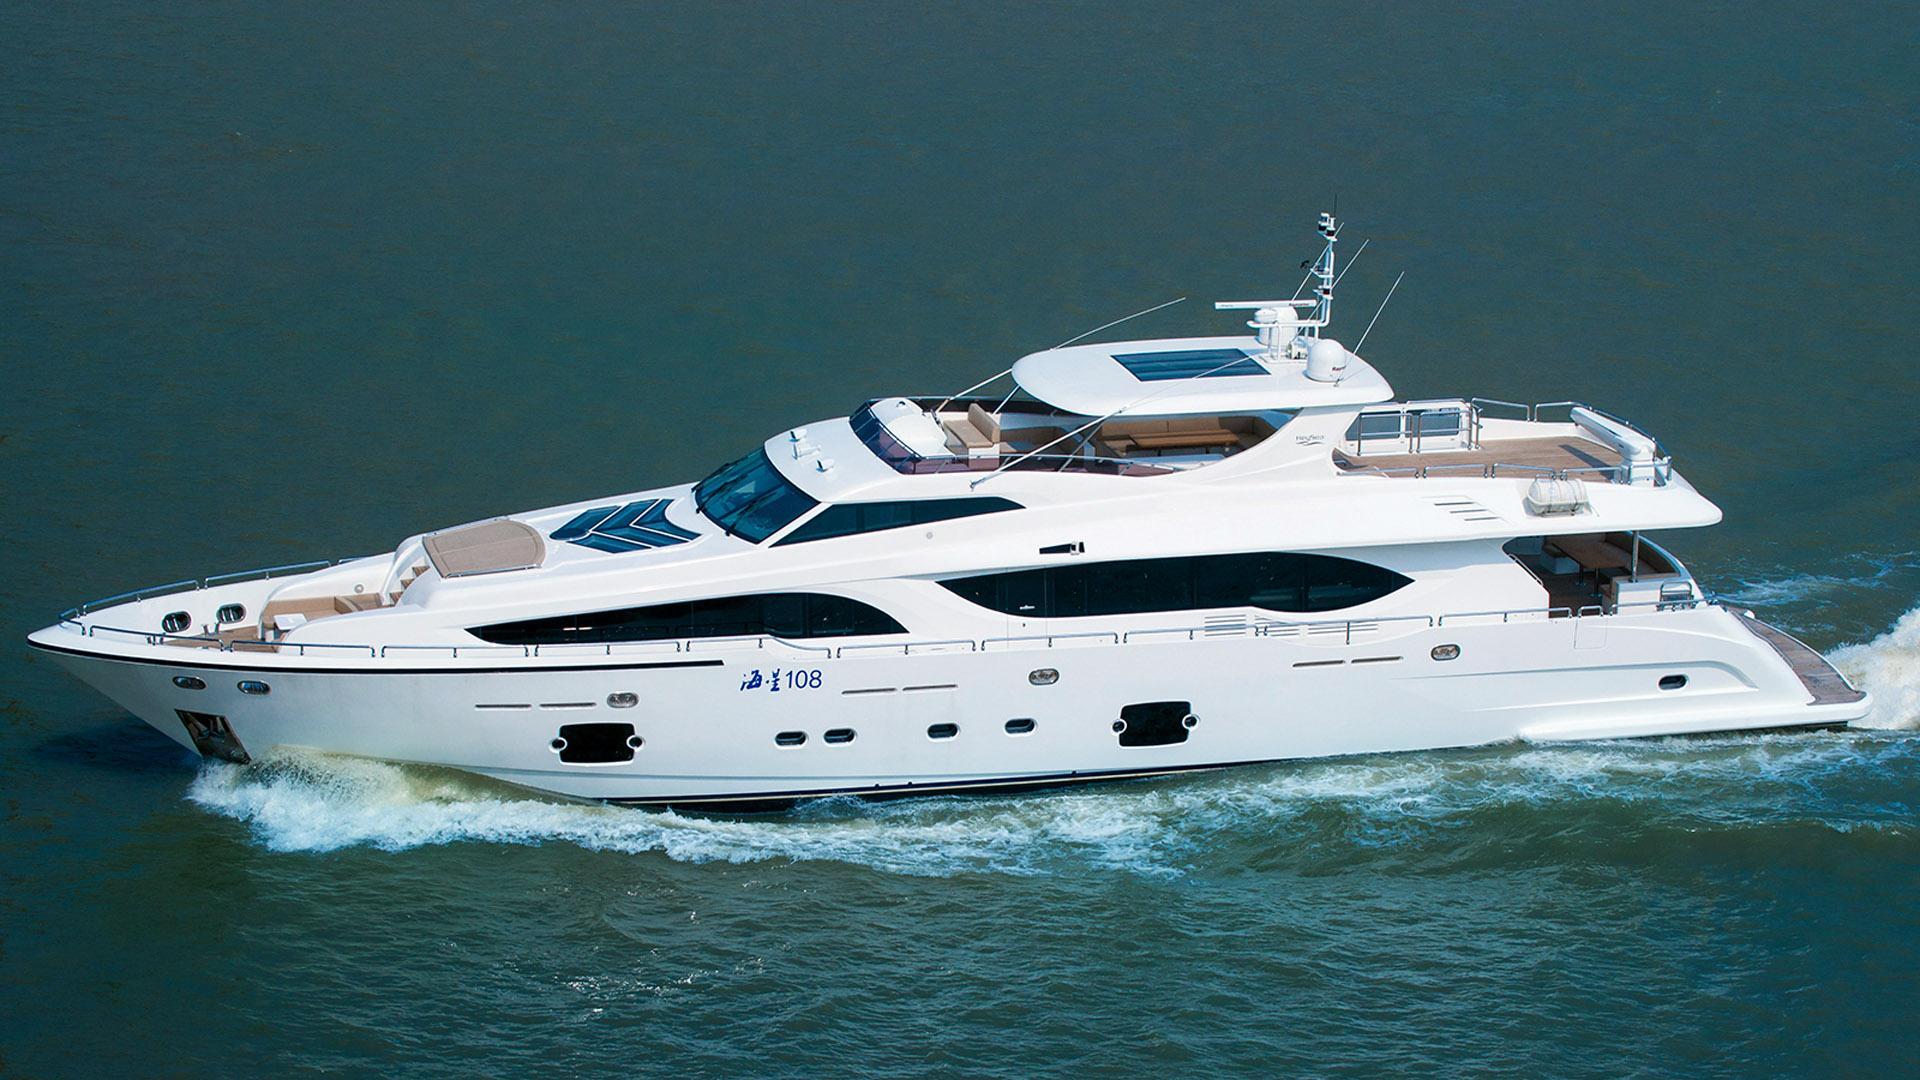 asteria 108 hull 2 motoryacht heysea 2013 33m profile sistership